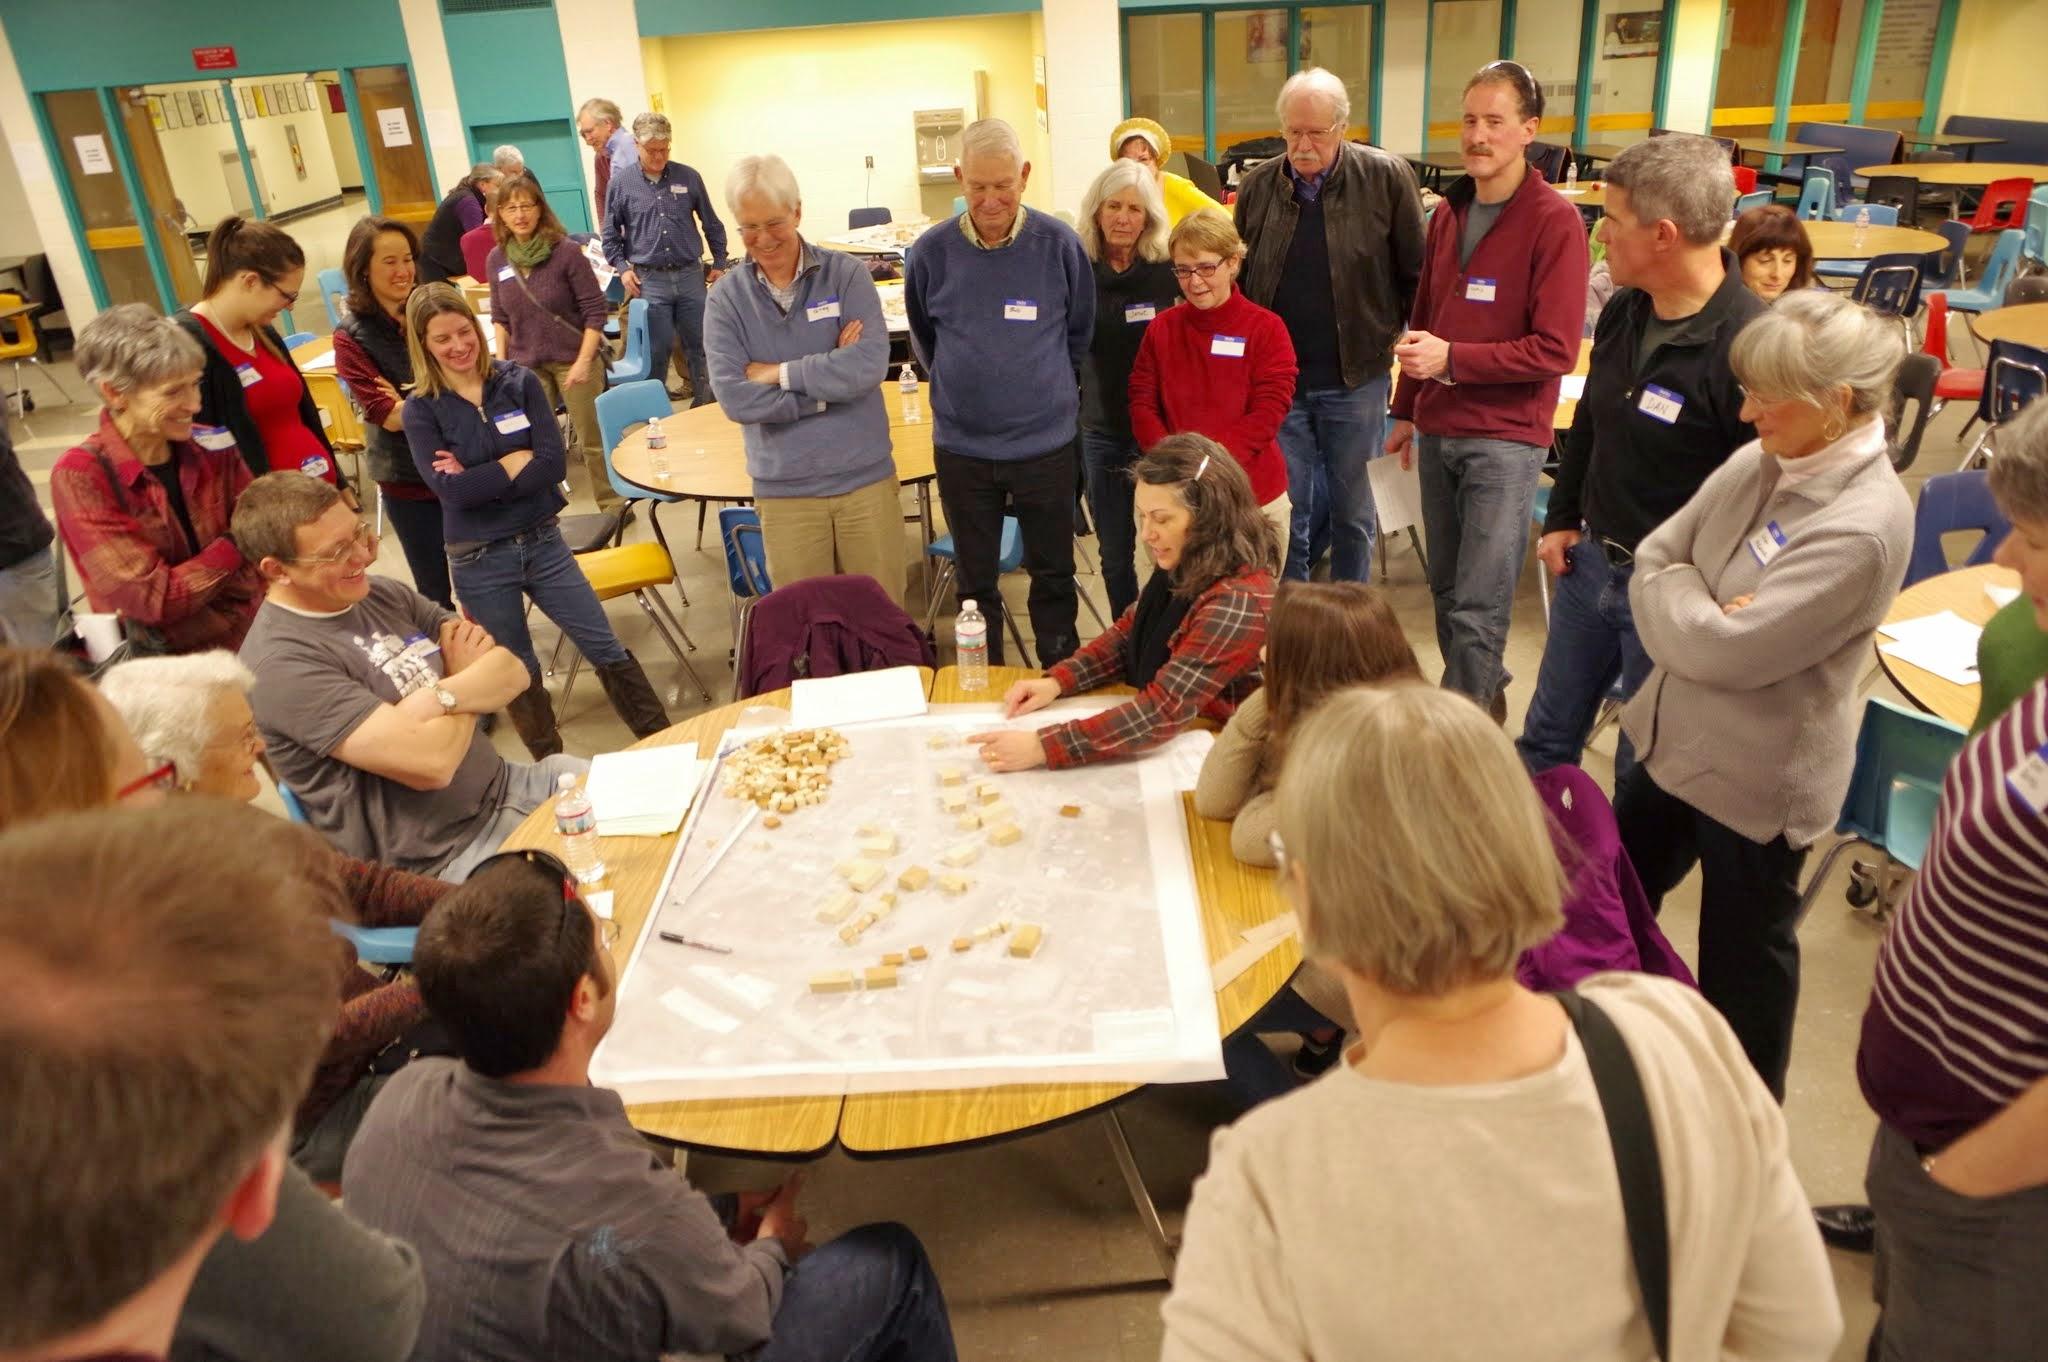 Public design workshop